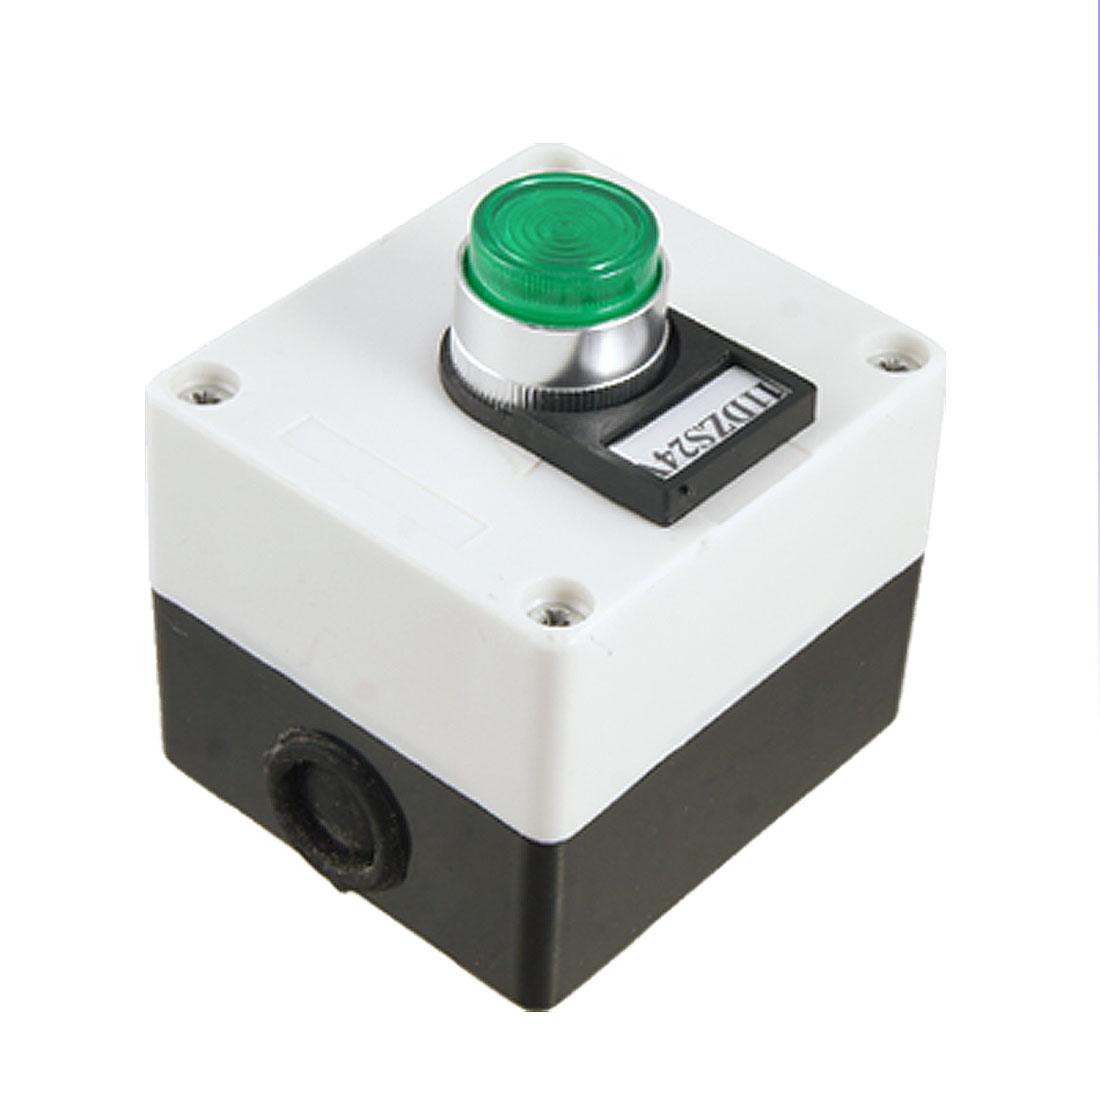 1NO 1NC Contact Self Locking Push Button Switch Station